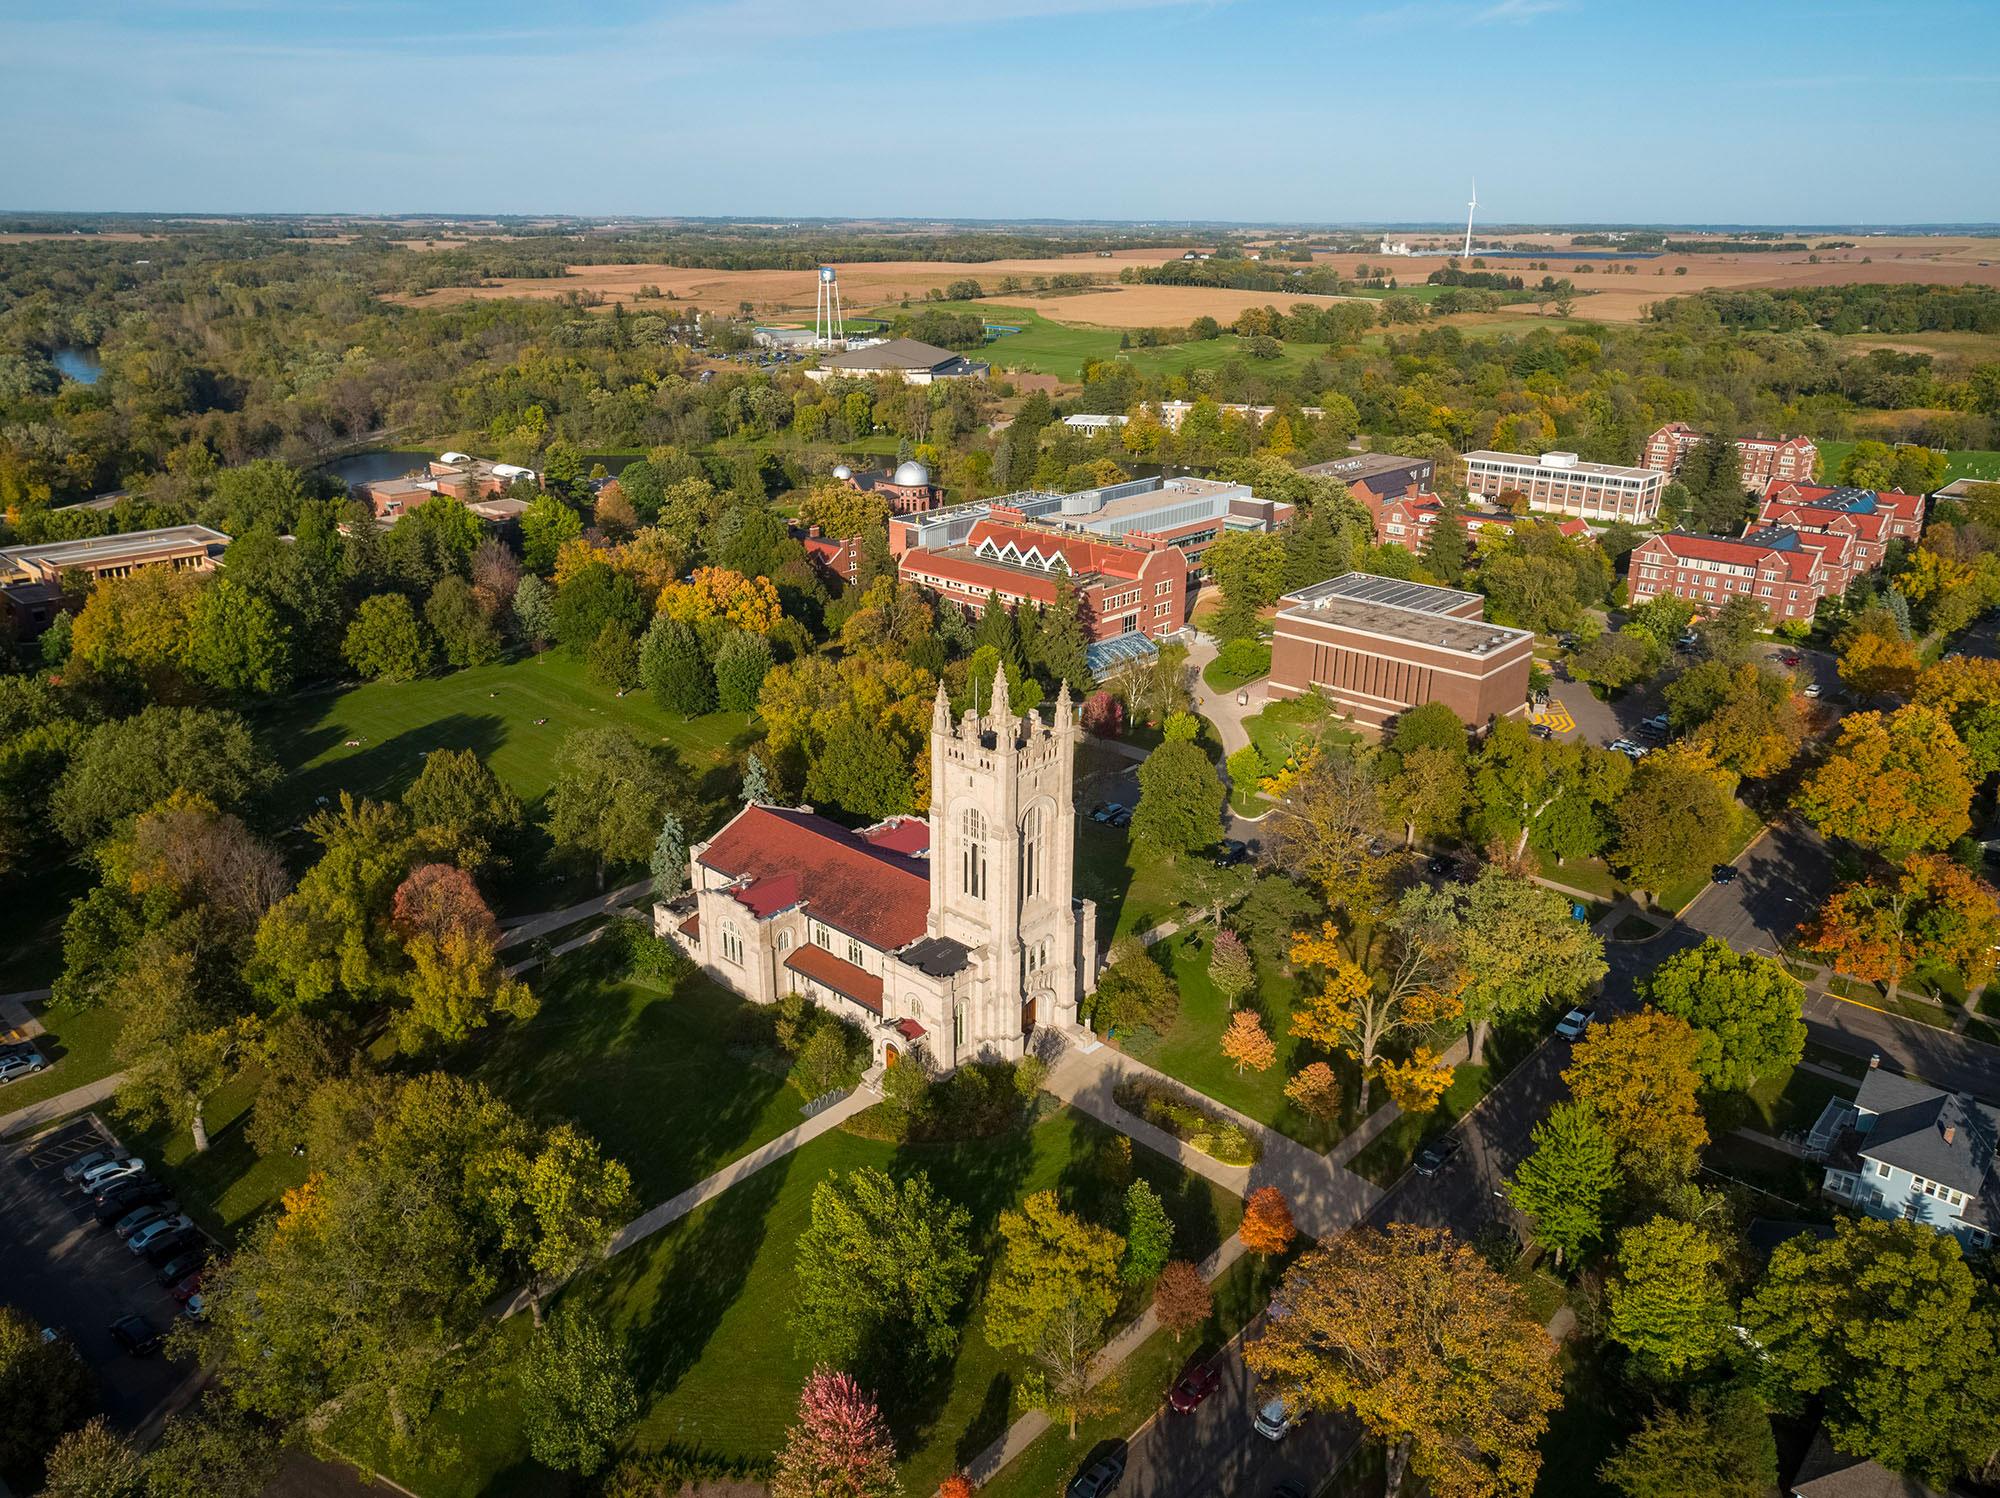 aerial view of Carleton campus focused on Chapel